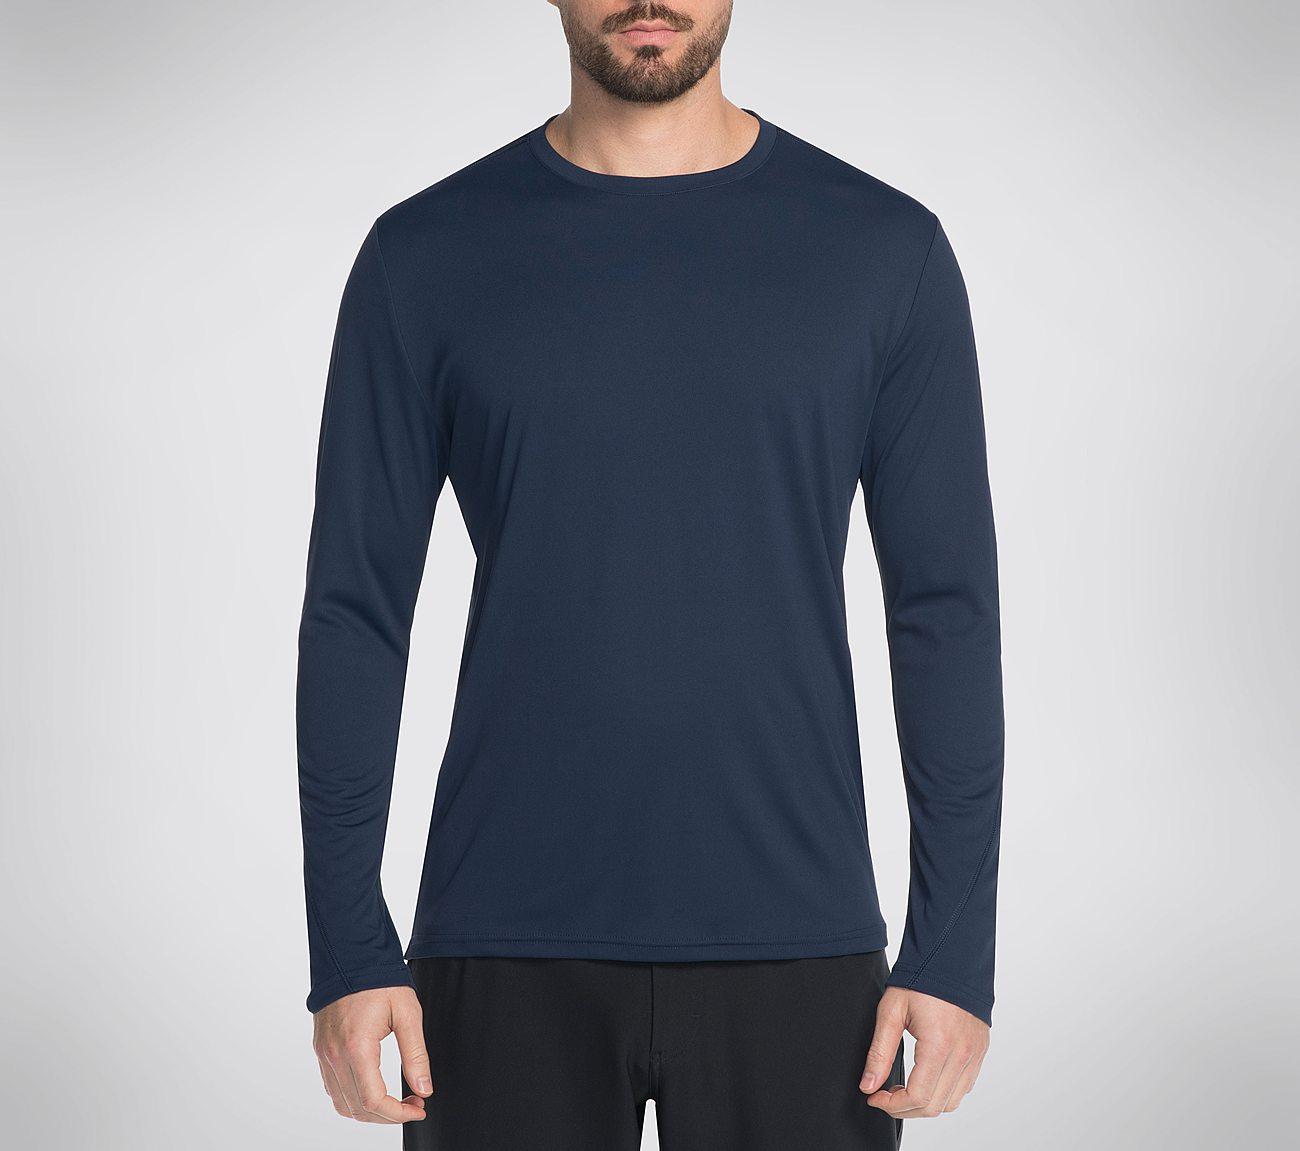 Skechers GO Dri Ultra LS Tee Shirt